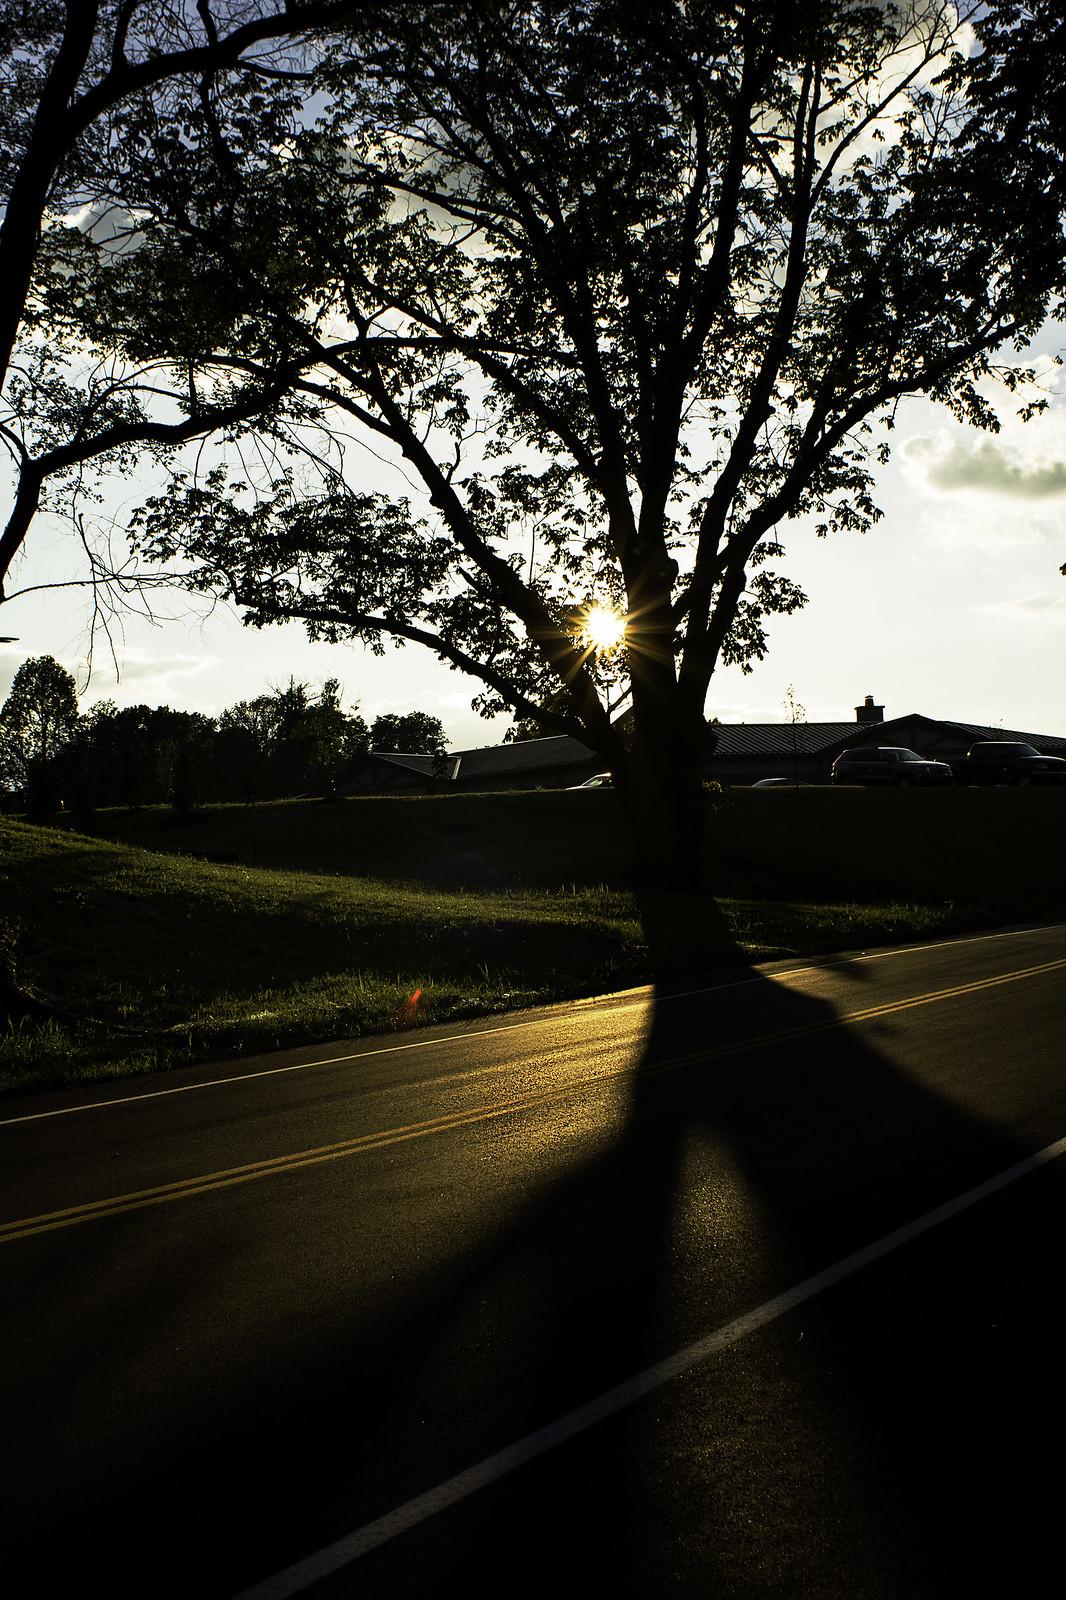 Sunset1, Canon EOS REBEL T2I, Canon EF 28mm f/1.8 USM